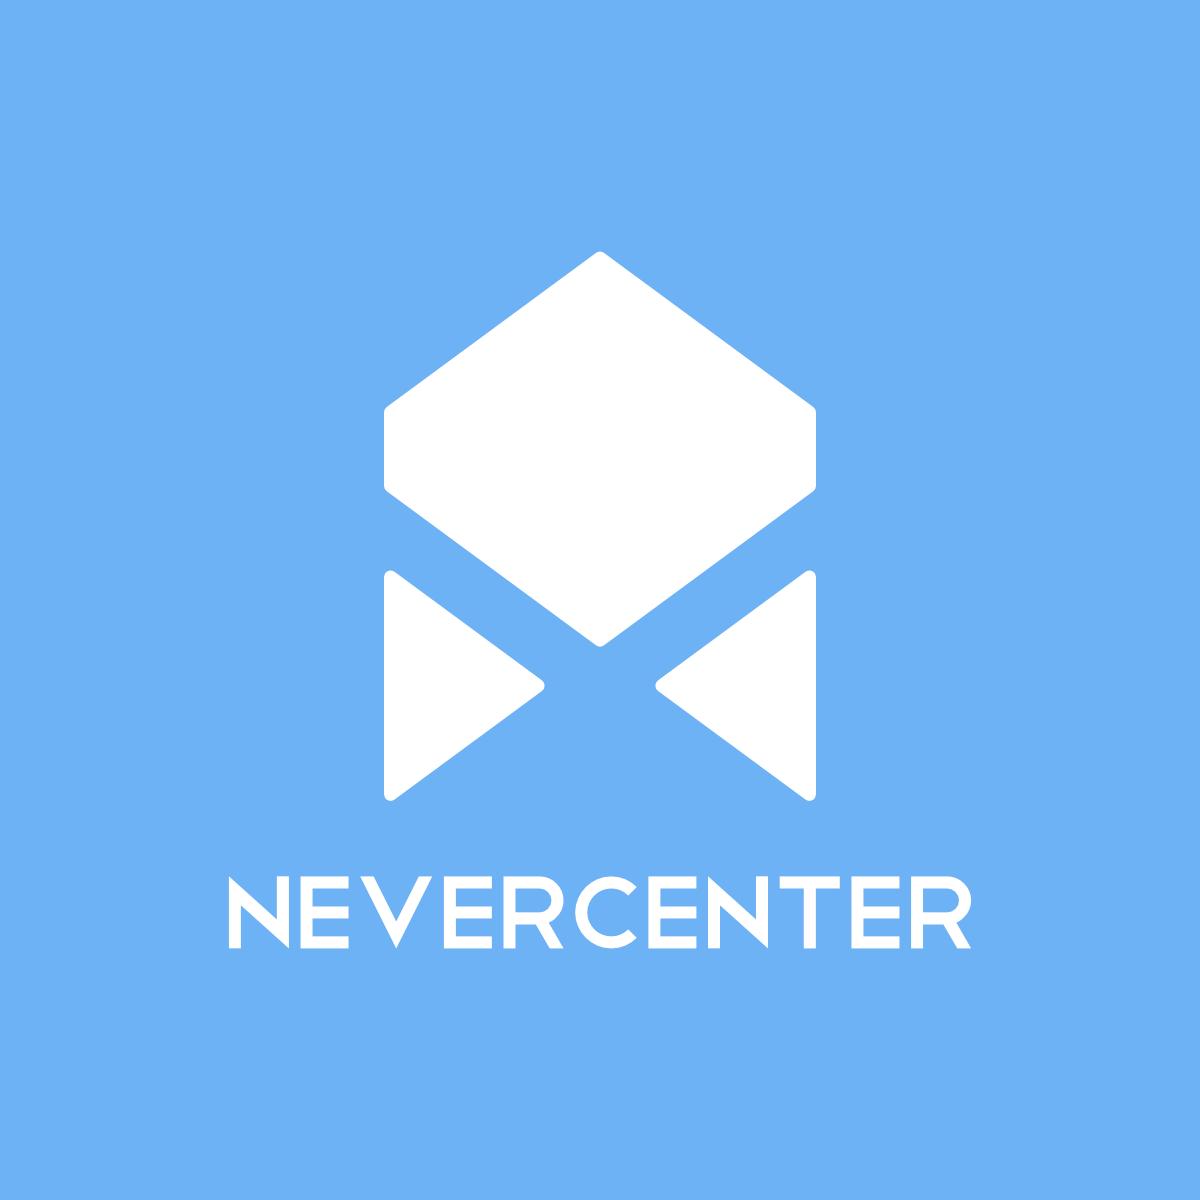 Nevercenter Pixelmash Free full Version Download